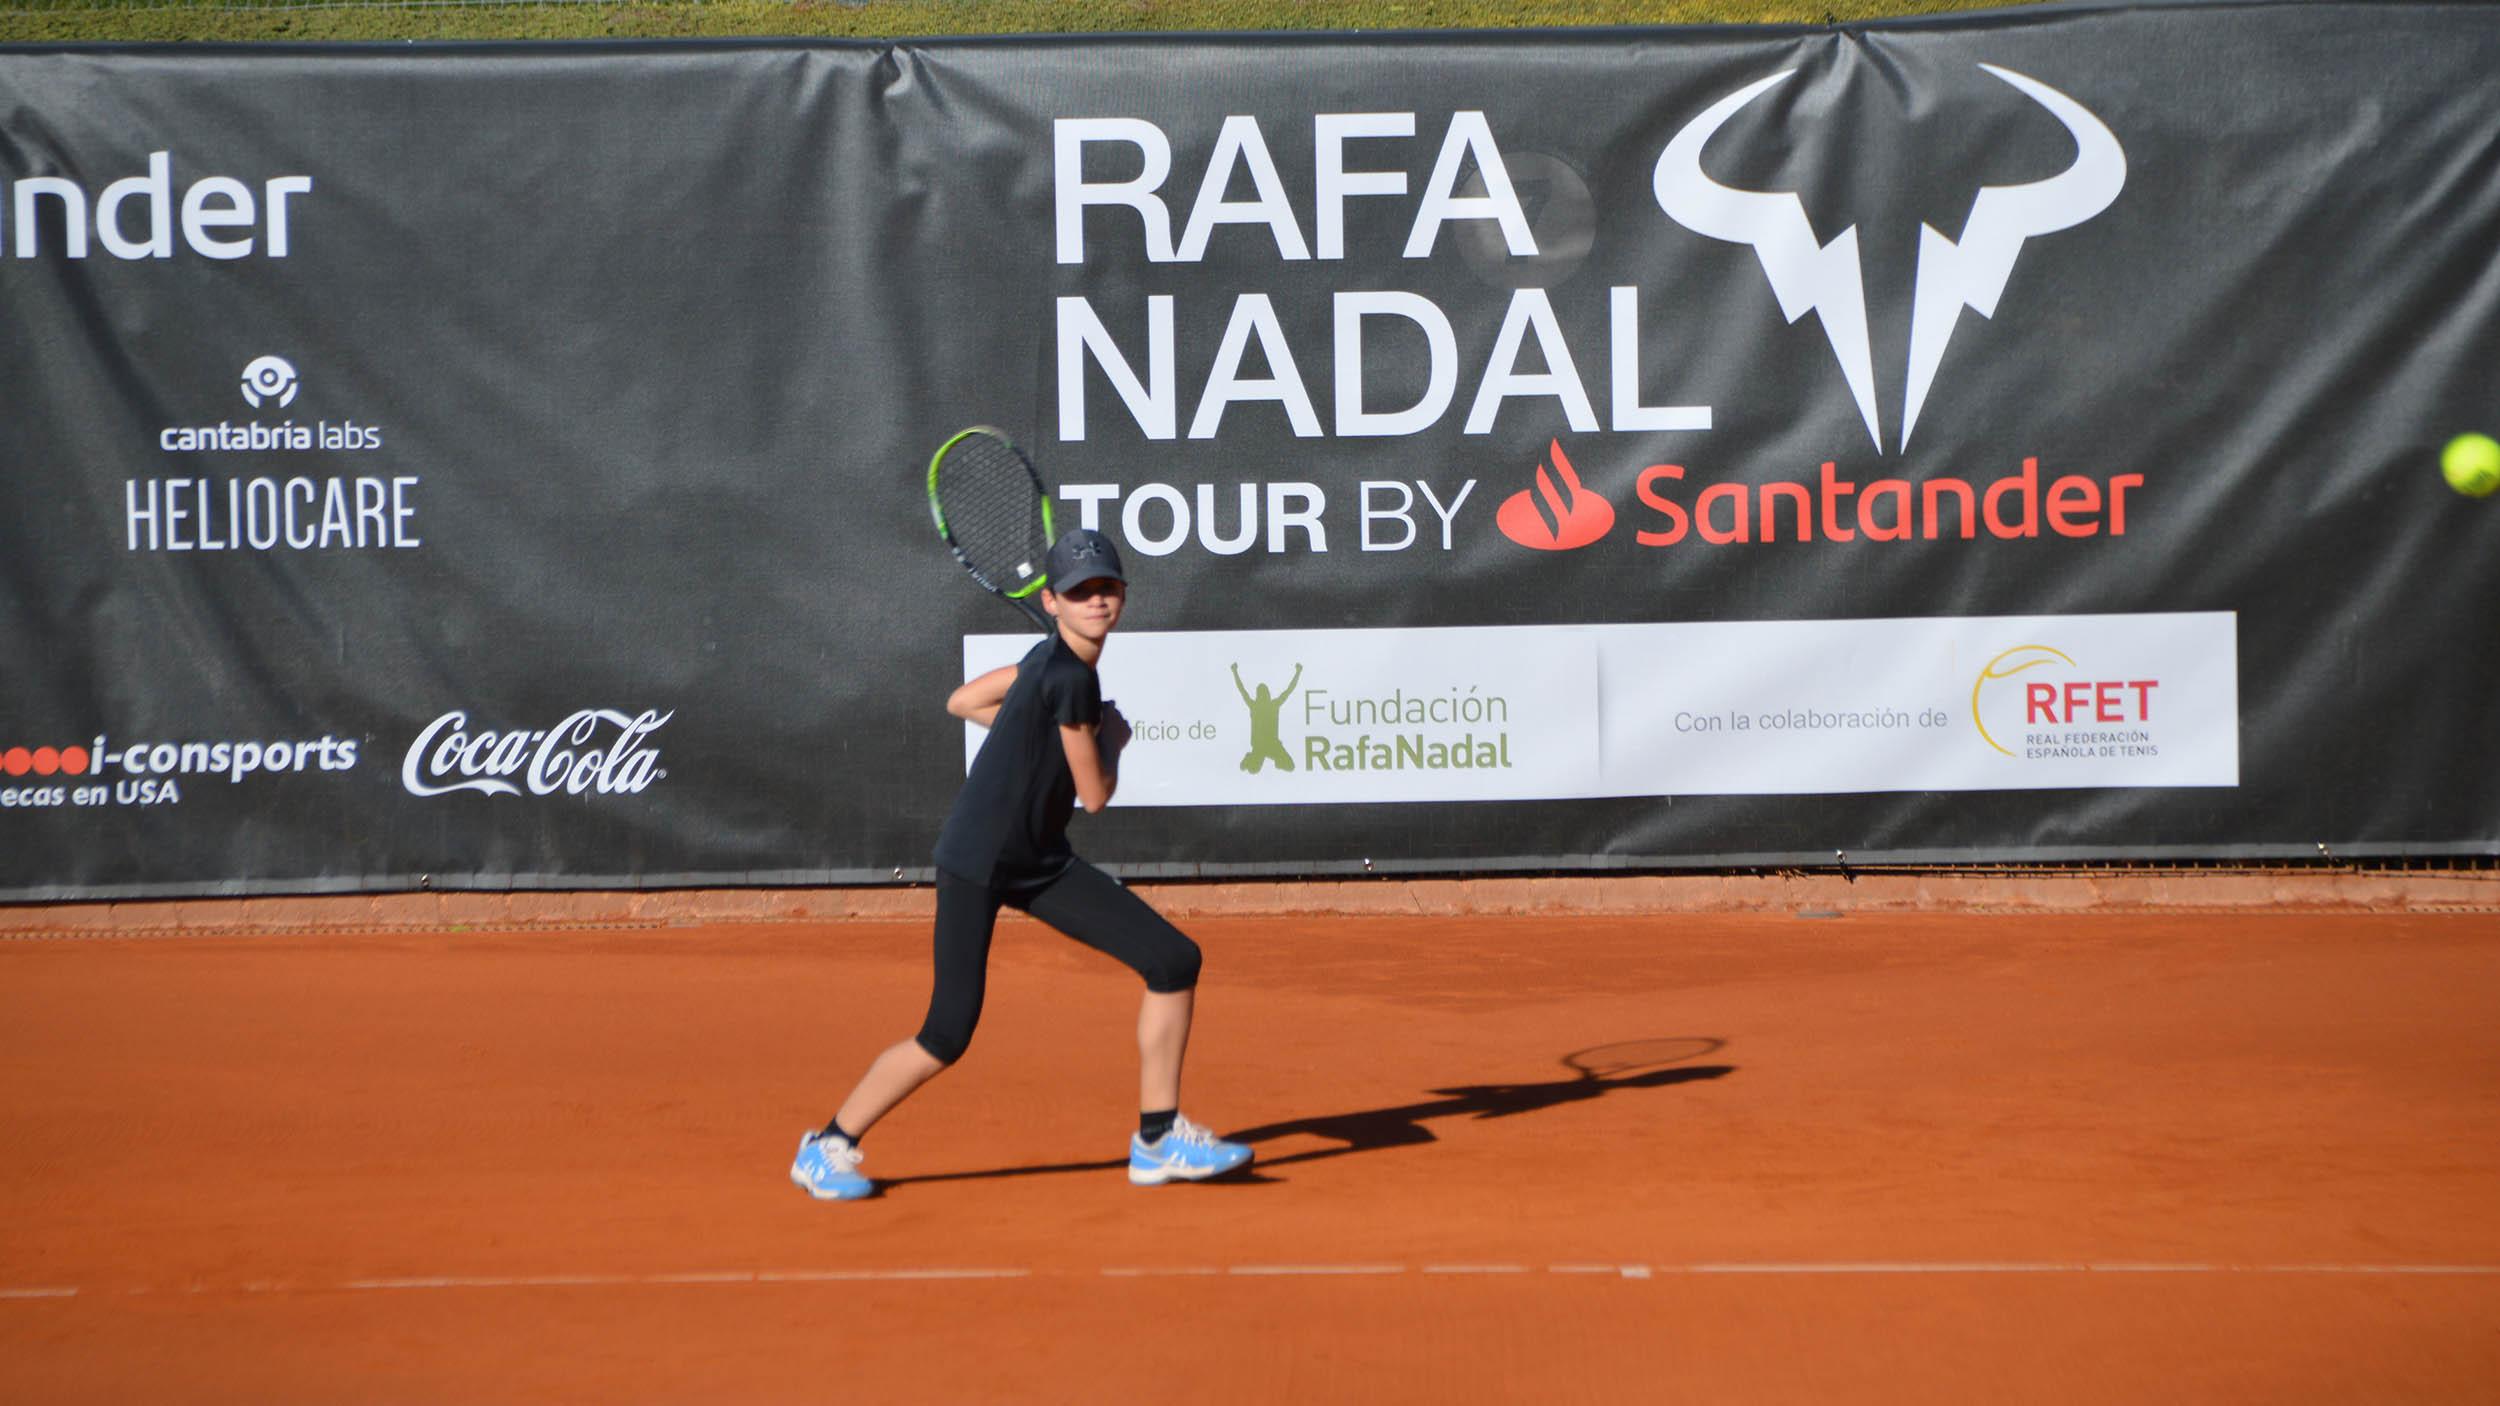 Imagen del primero torneo del Rafa Nadal Tour by Santander